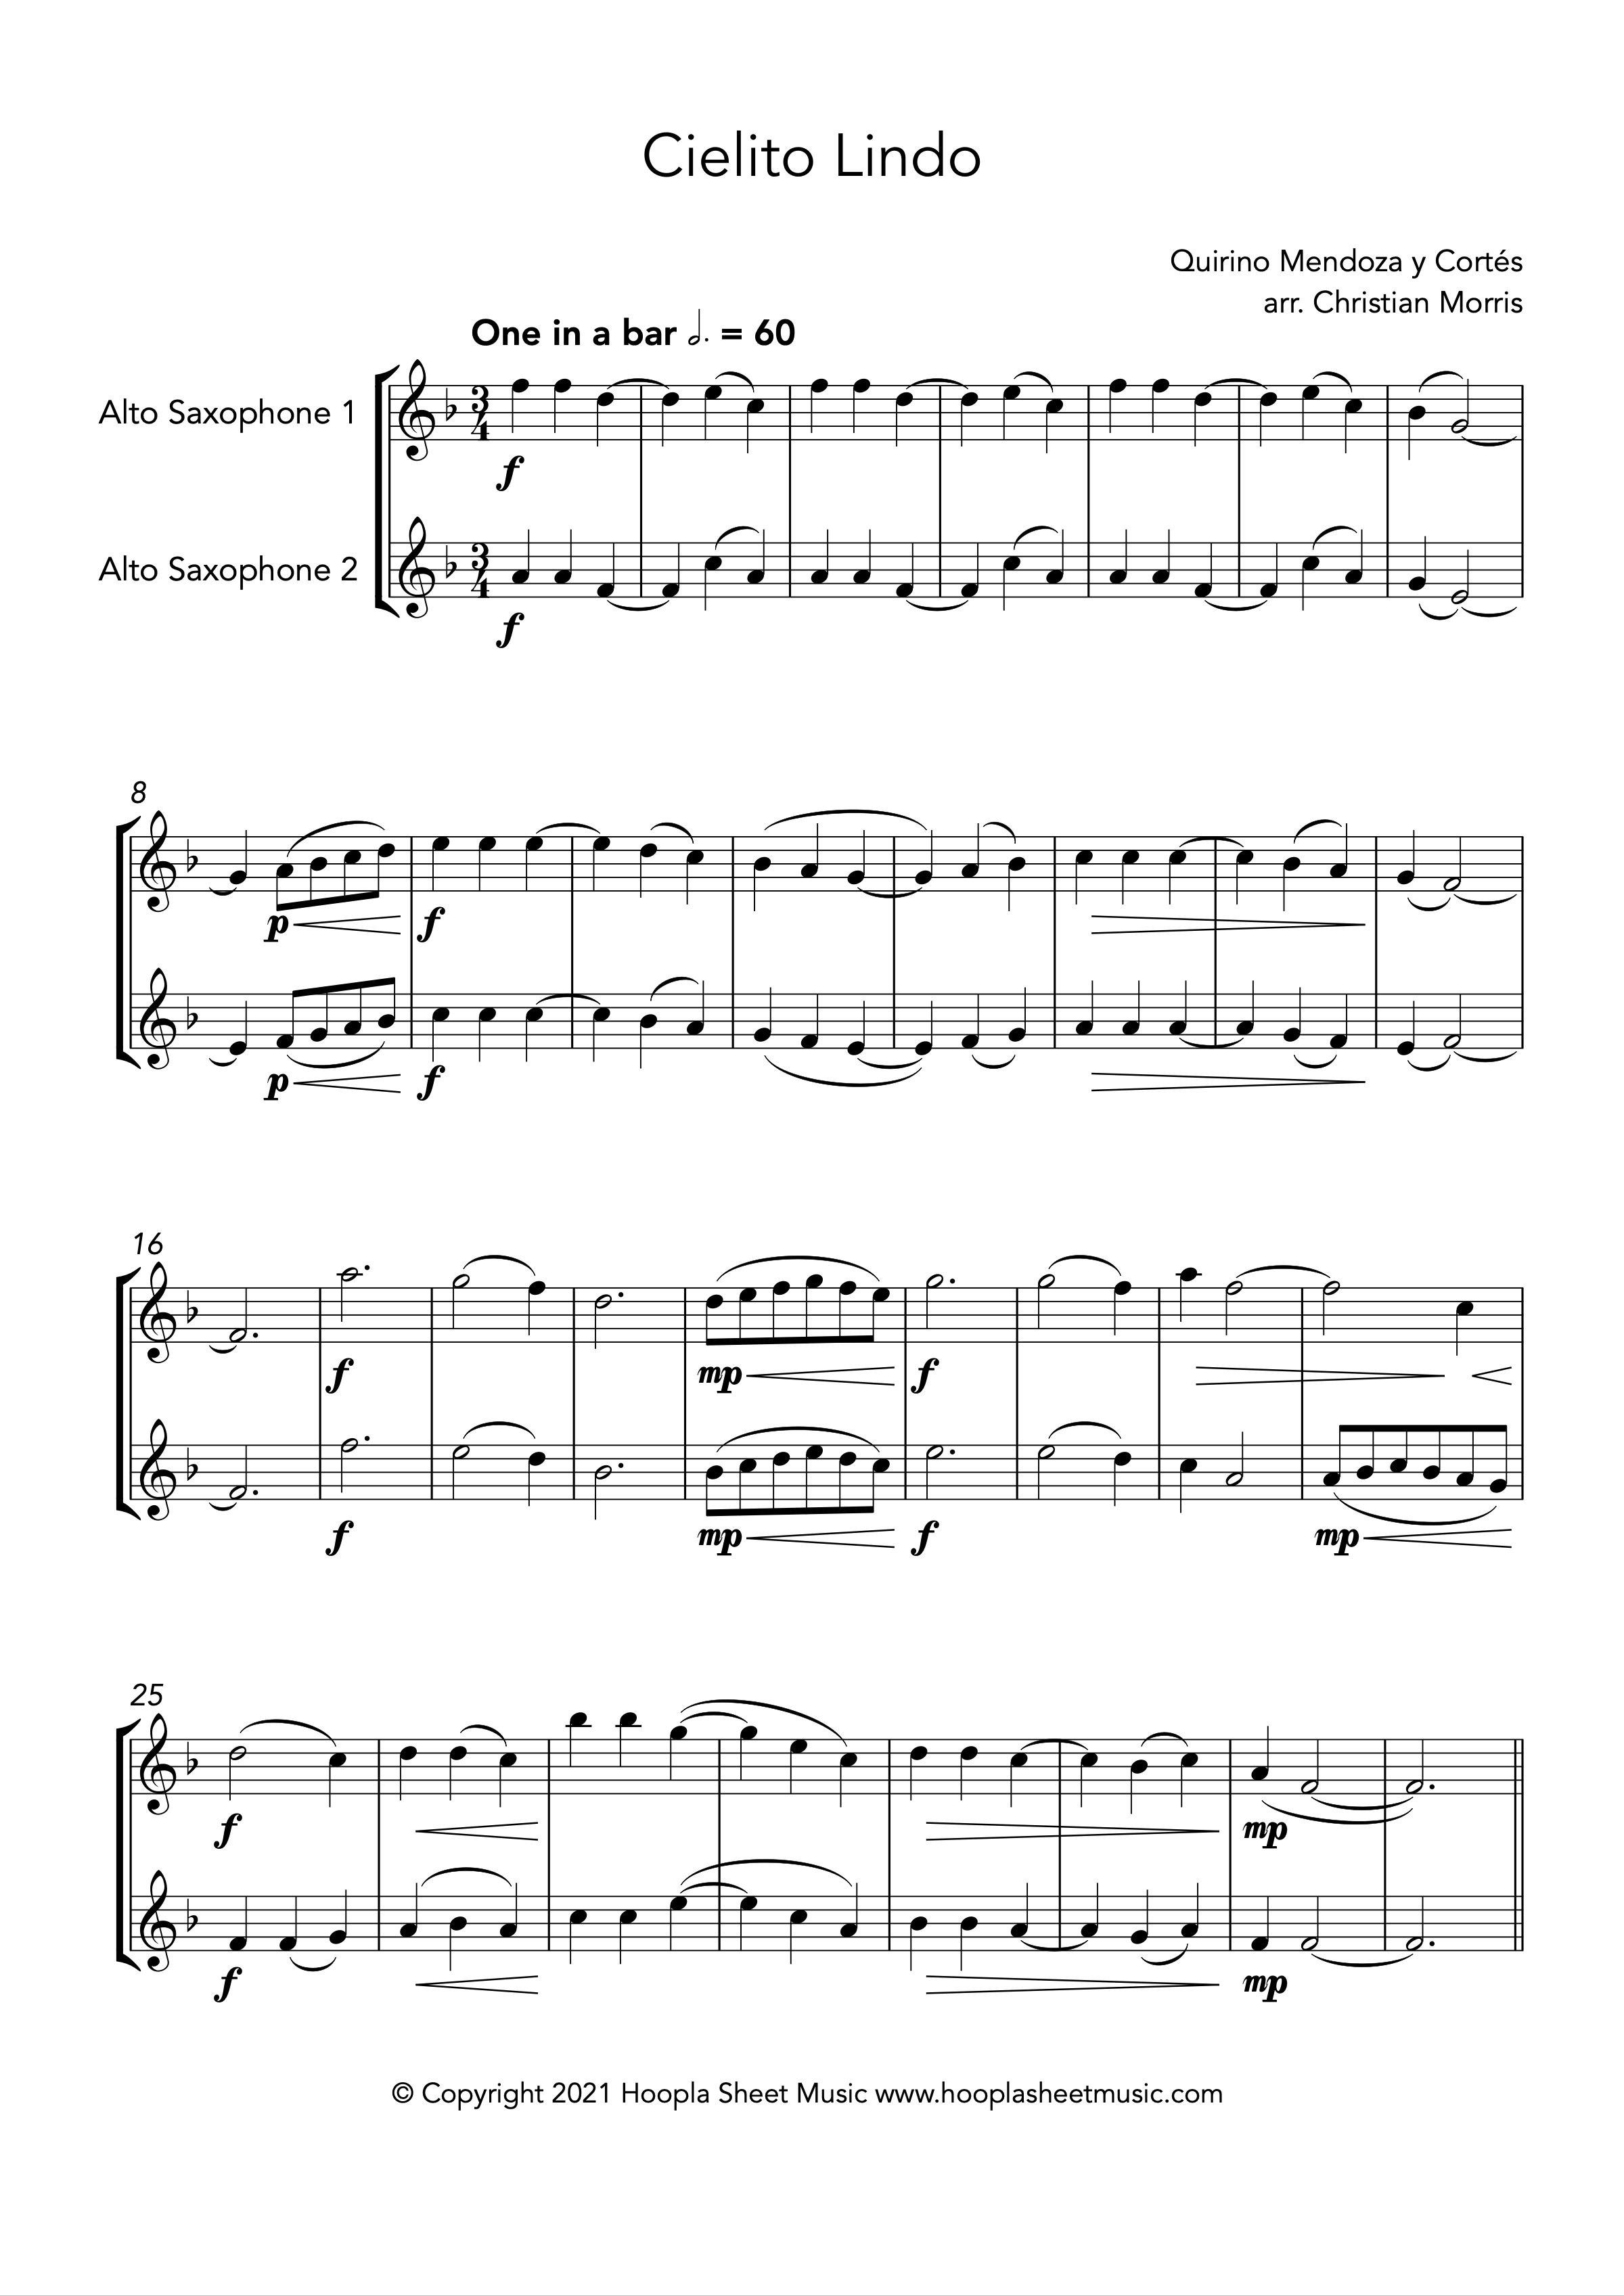 Cielito Lindo (Alto Saxophone Duet)